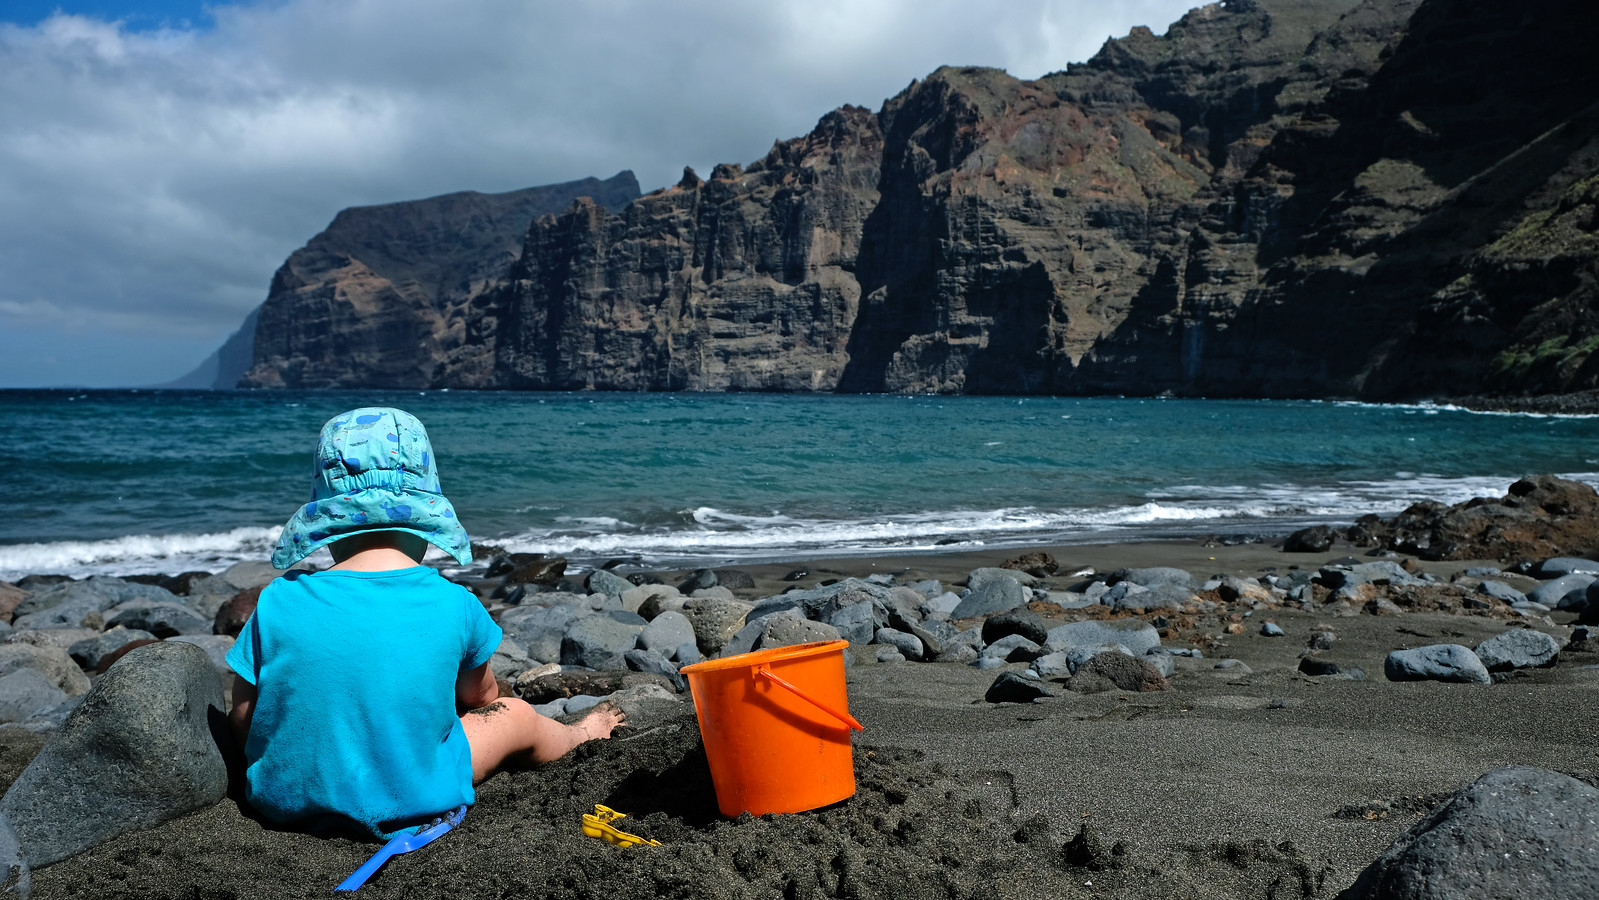 Los Gigantes, Tenerife, Canary Islands, Spain